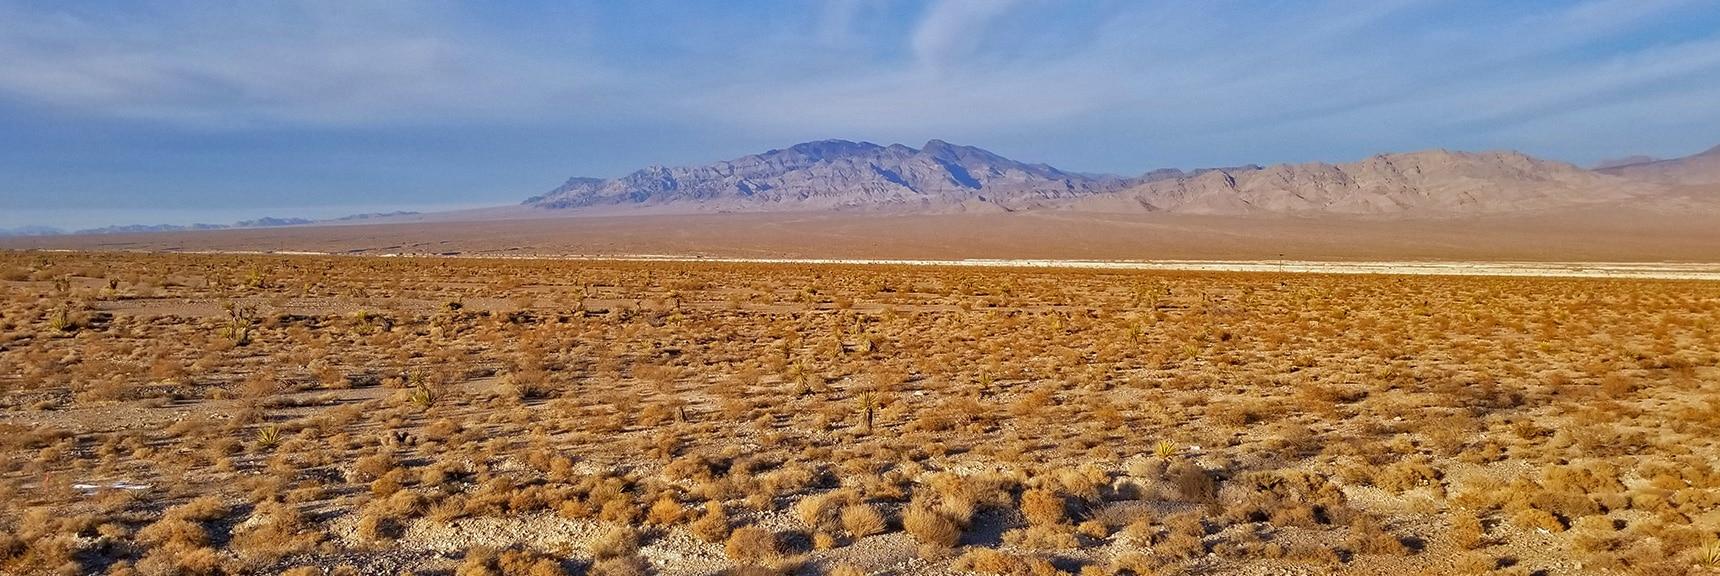 View North of Moccasin Toward Sheep Range | Snapshot of Las Vegas Northern Growth Edge on January 3, 2021